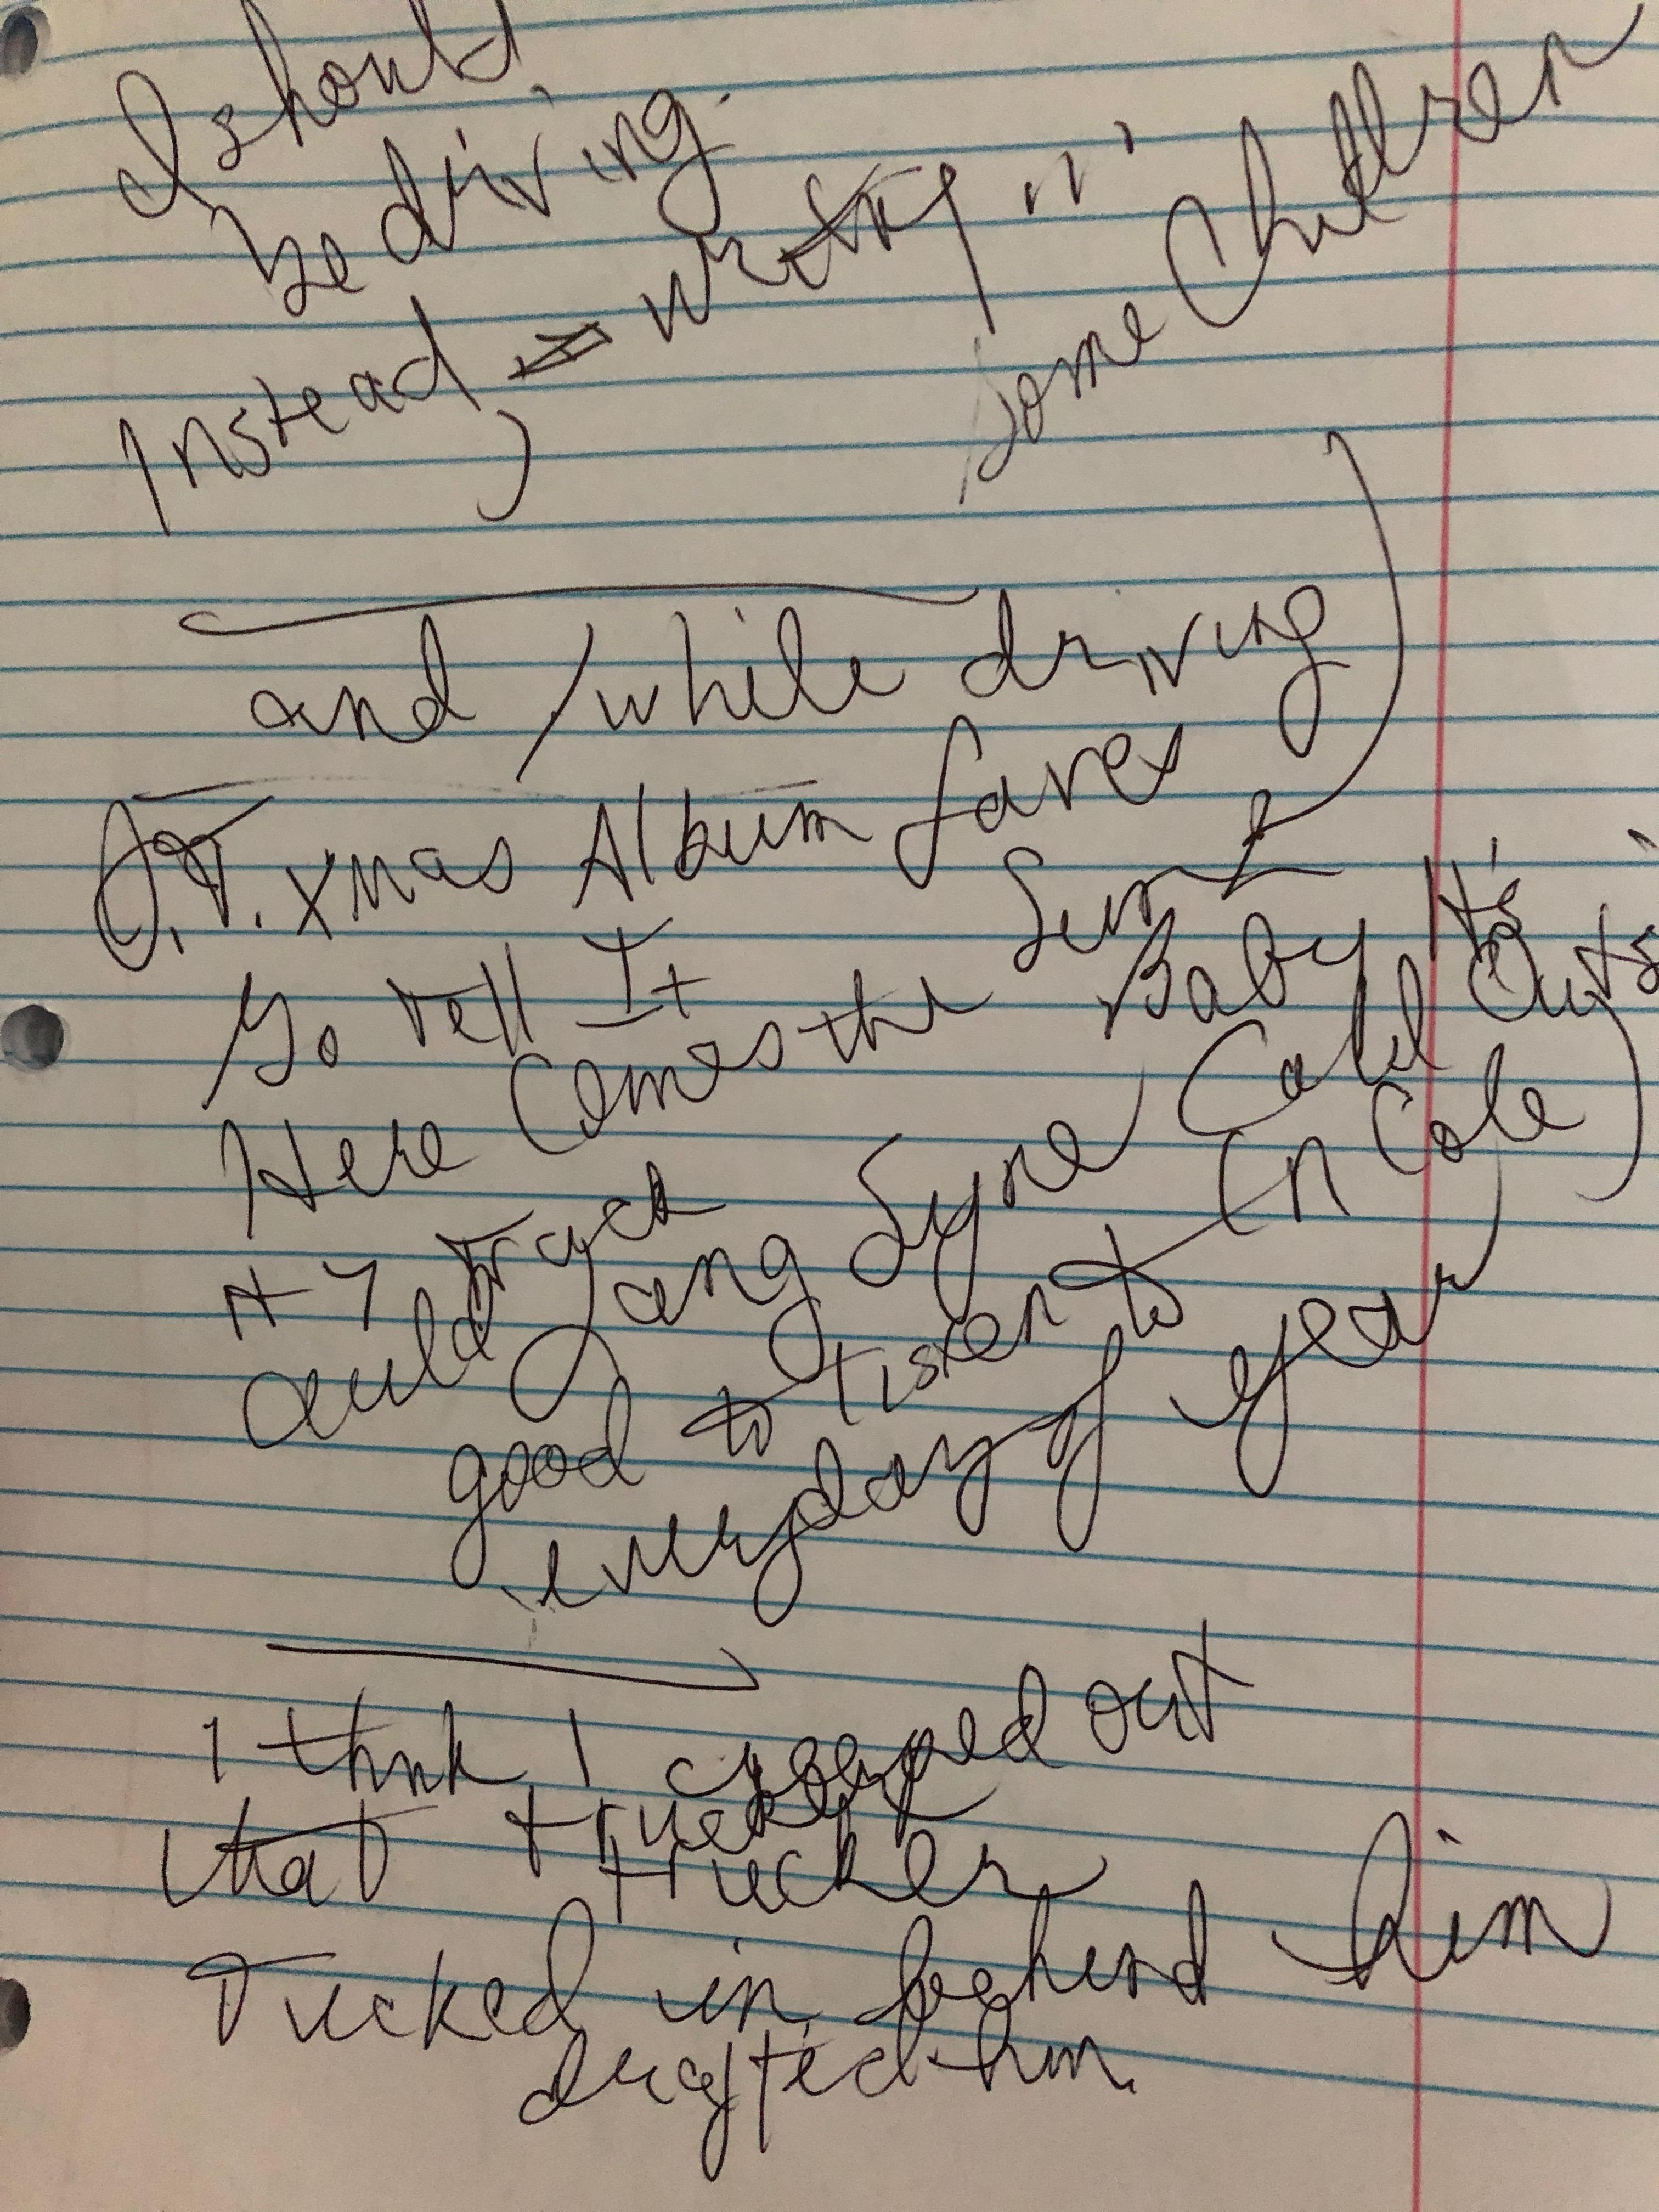 handwritten notes on a piece of binder paper